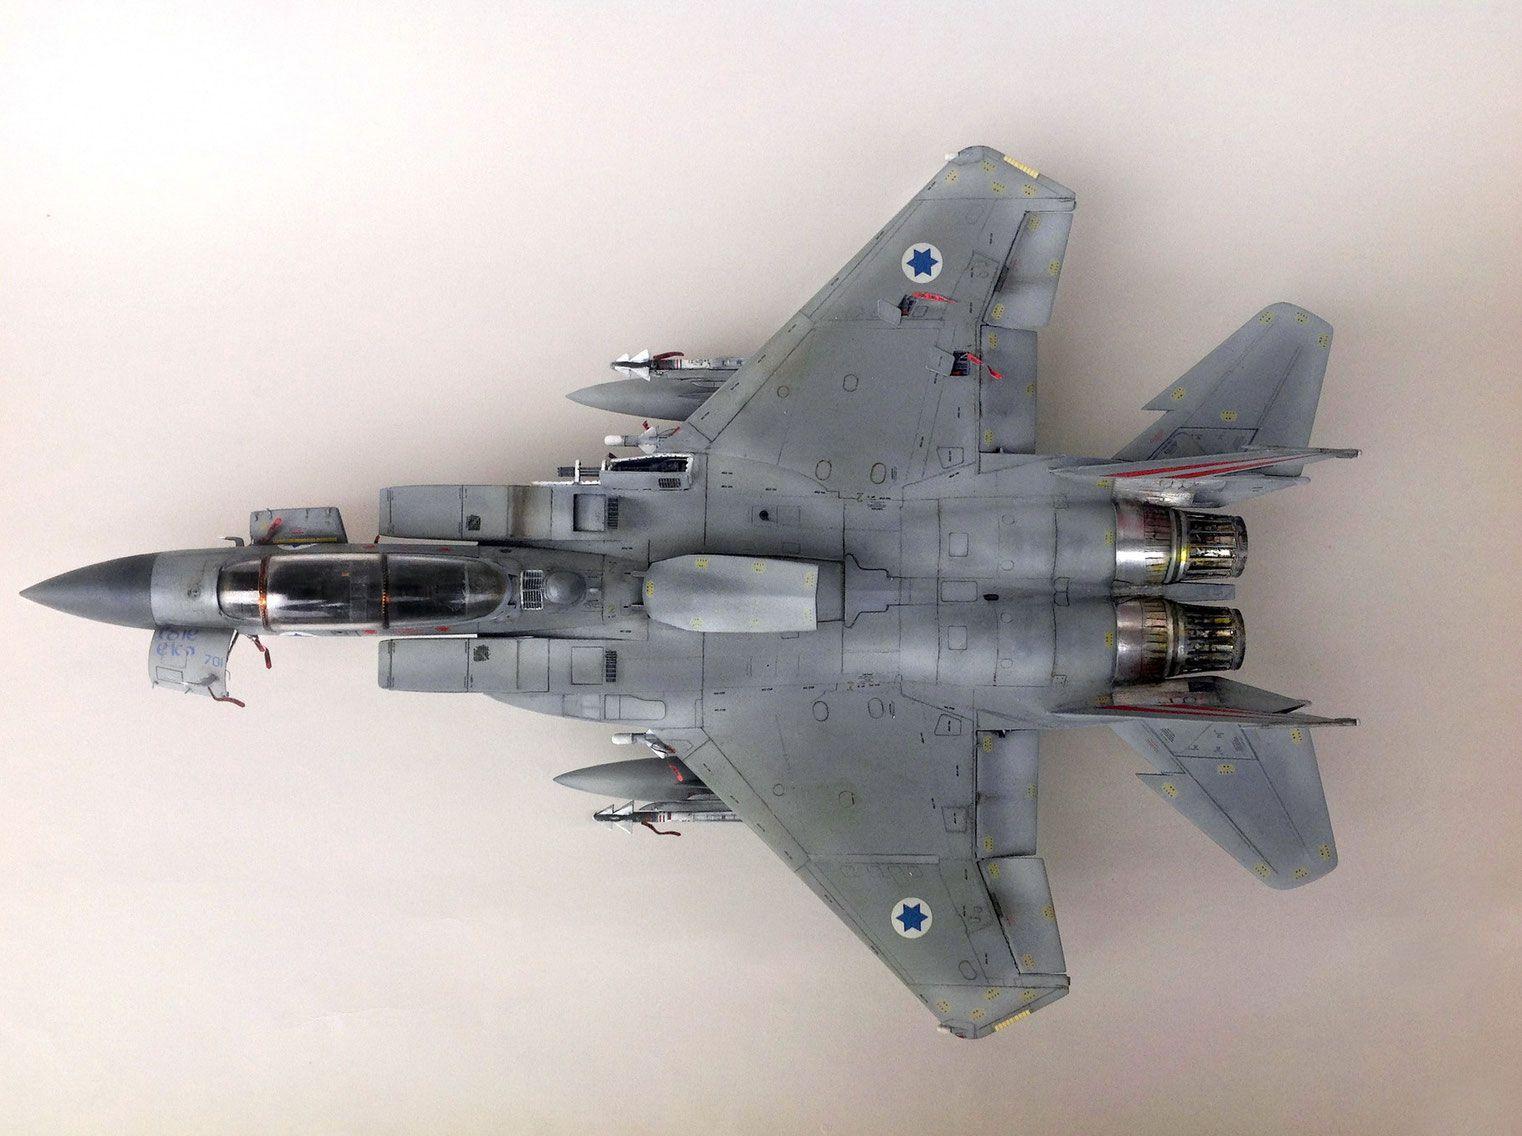 Fighter Jet Plastic Combat Aircraft Model F15 F-15 Israel Air Force IDF Plane